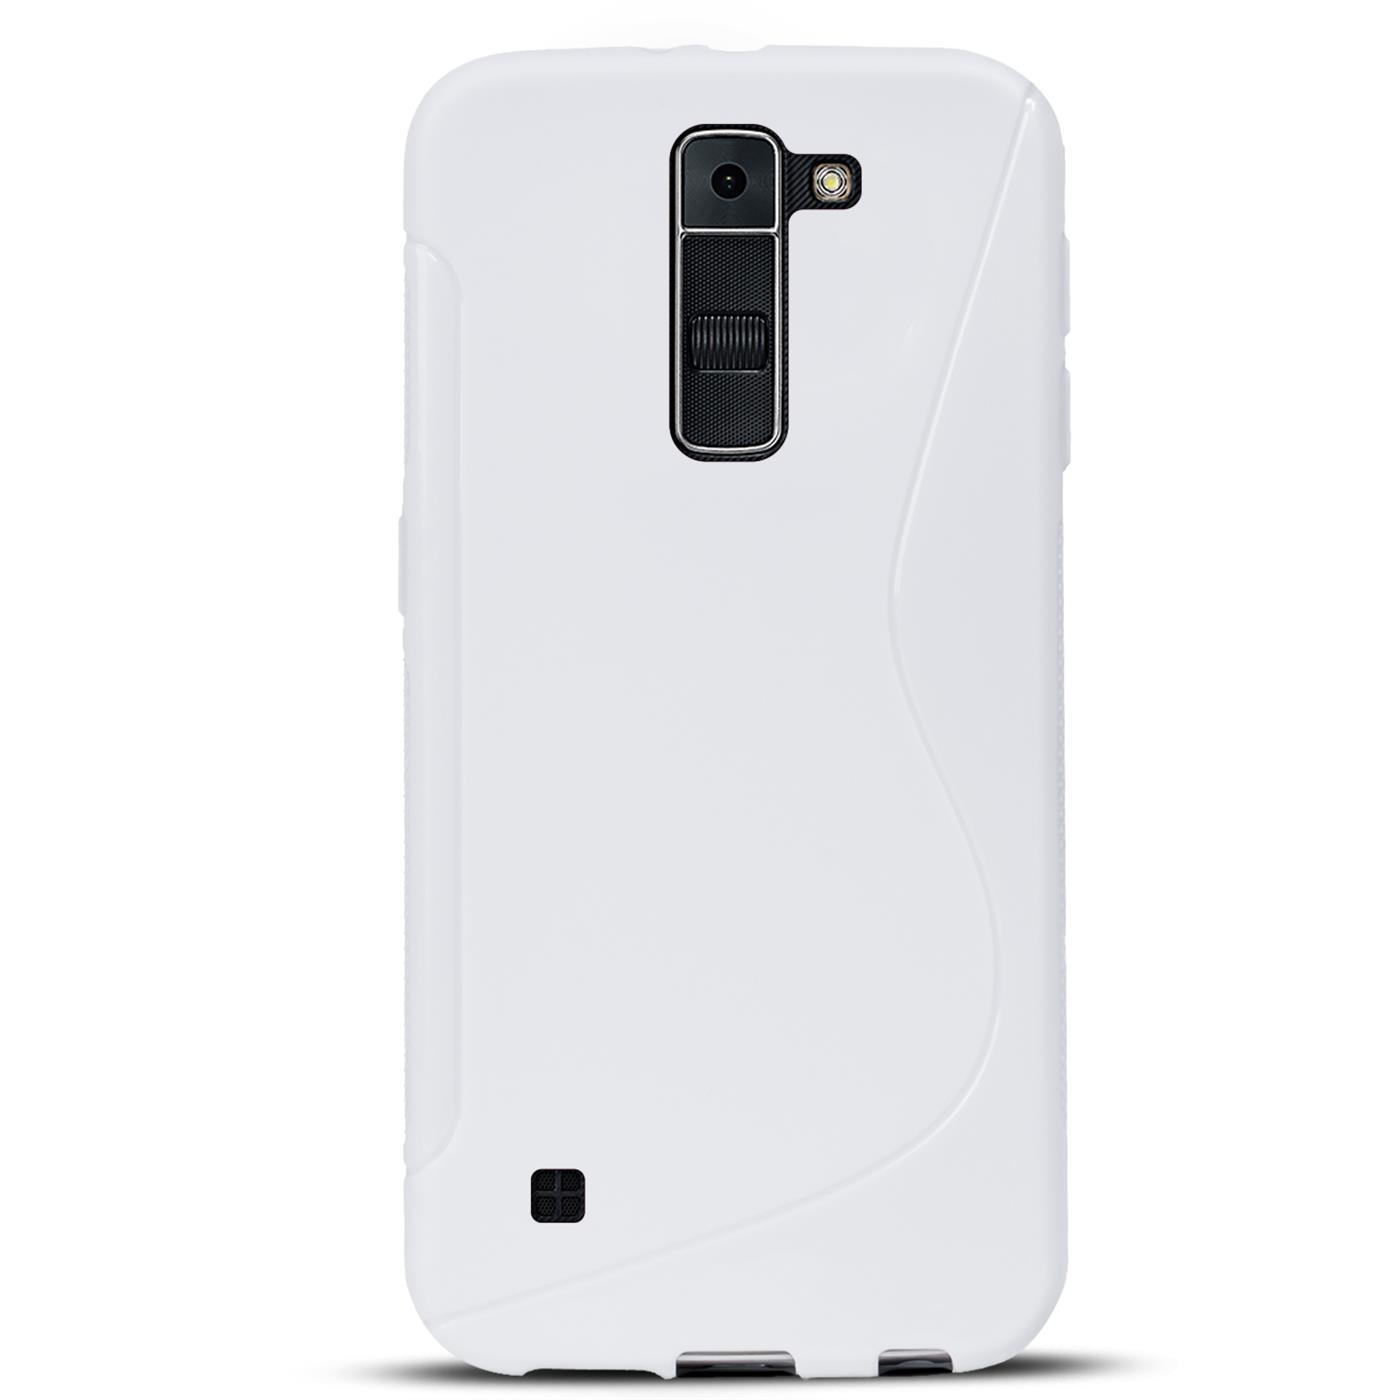 LG-Leon-LTE-Silikon-Gel-S-Line-Case-Cover-Ultra-Thin-Slim-Back-Bumper Indexbild 29